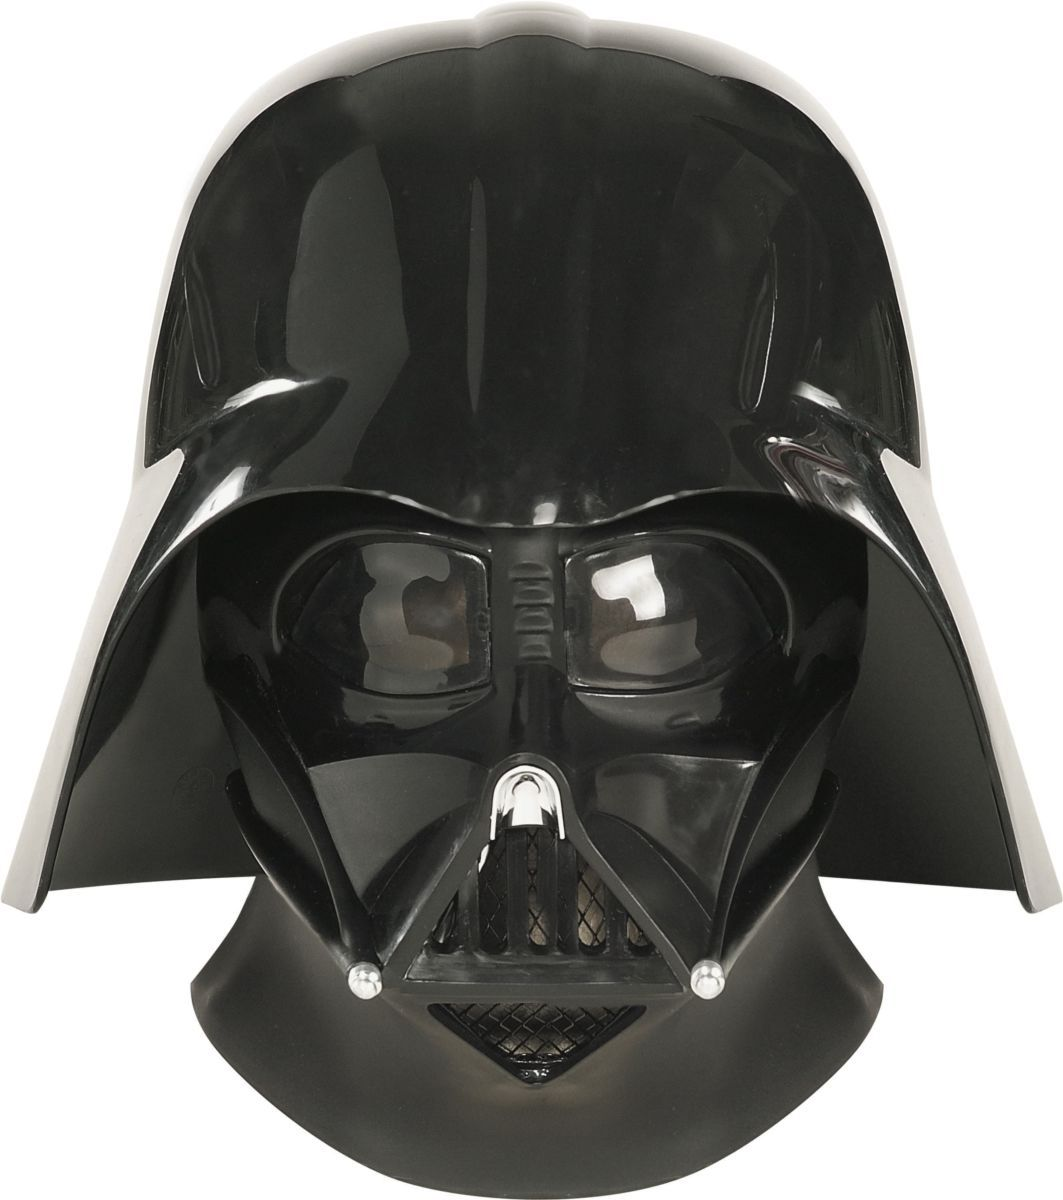 Capacete Darth Vader: Star Wars (Acessório Fantasia) - Rubies Costumes - CD